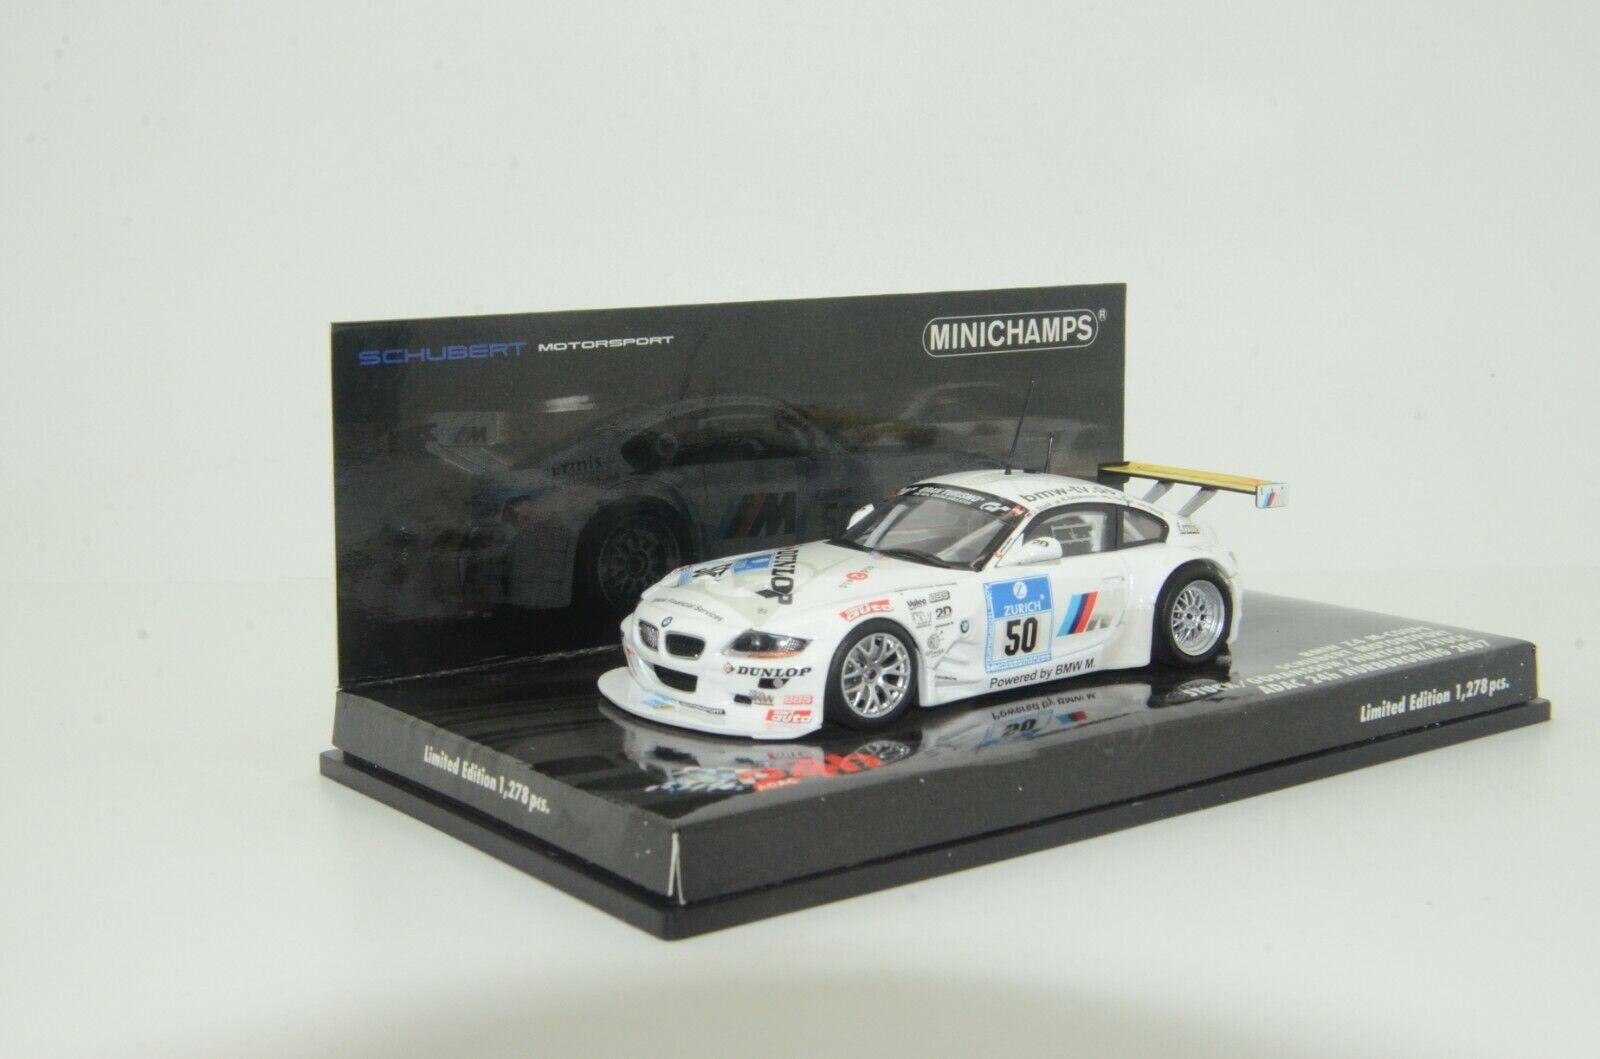 moda RARE RARE RARE    BMW Z4 M-Coupe Adac 24h Nurburgring 2007 Minichamps 72750 1 43  hasta 42% de descuento